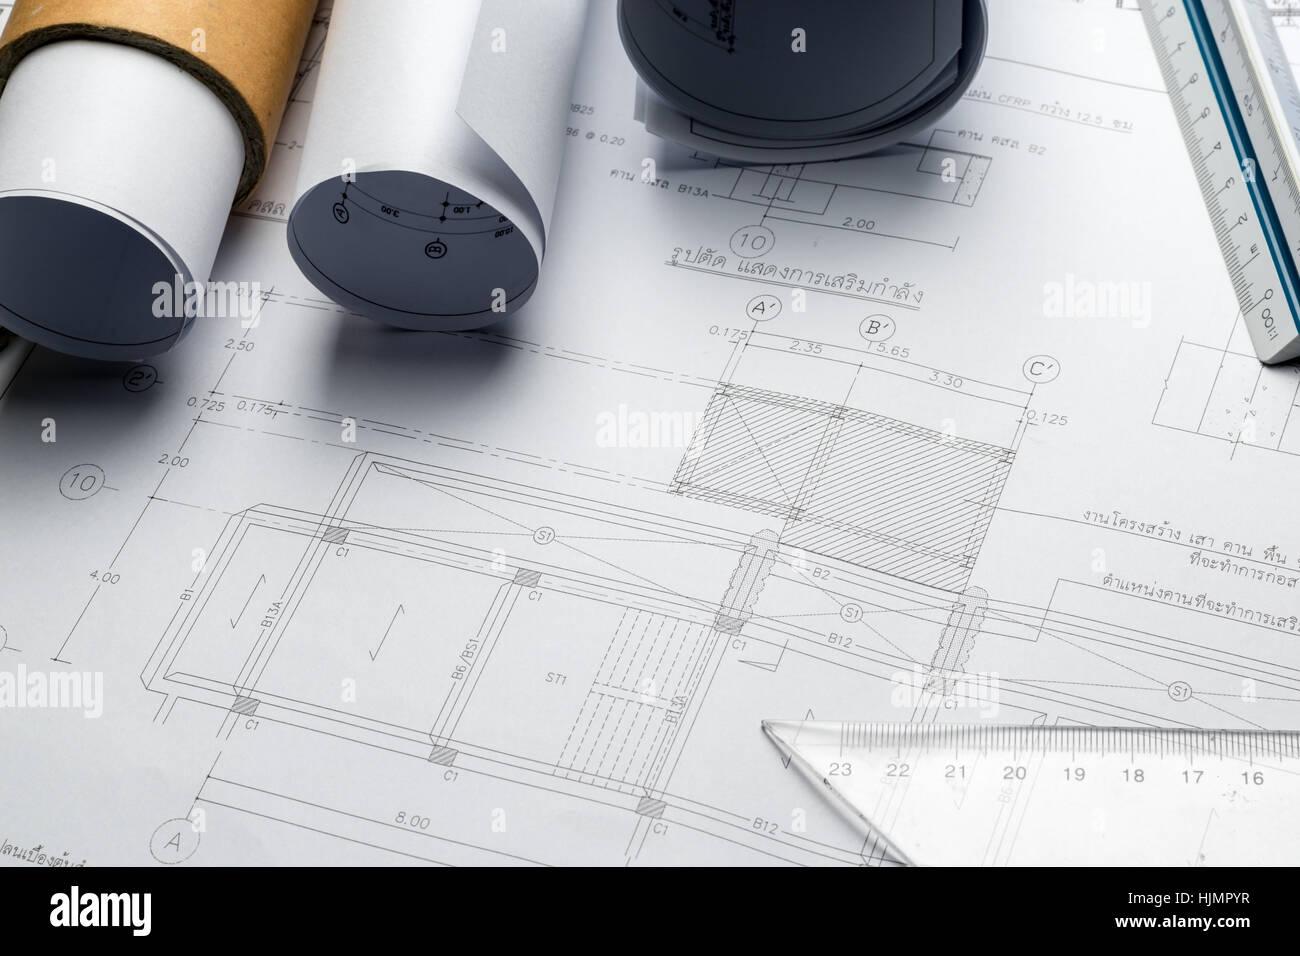 Engineering diagram blueprint paper drafting project sketch stock engineering diagram blueprint paper drafting project sketch architecturalselective focus malvernweather Choice Image